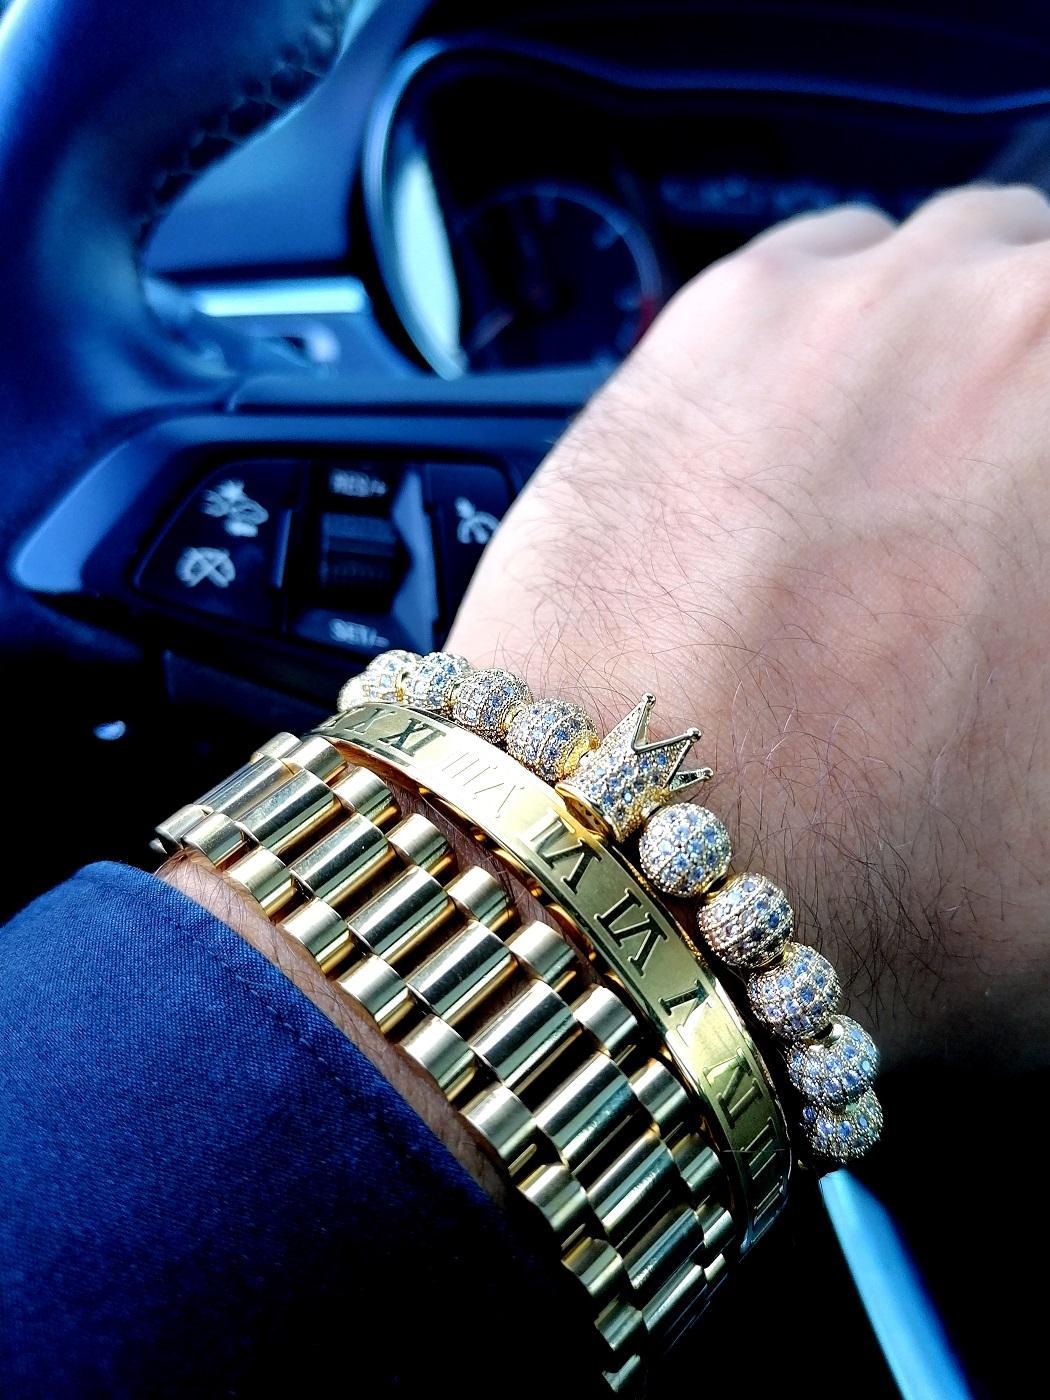 Real Diamond Bracelet, His Queen Her King Bracelets, Real Diamond Bracelet Mens, Bracelets For Him, Charm Bracelets, Beaded Bracelets, Bangle Bracelets, Beads For Bracelets, 14K Gold And Diamond Tennis Bracelet